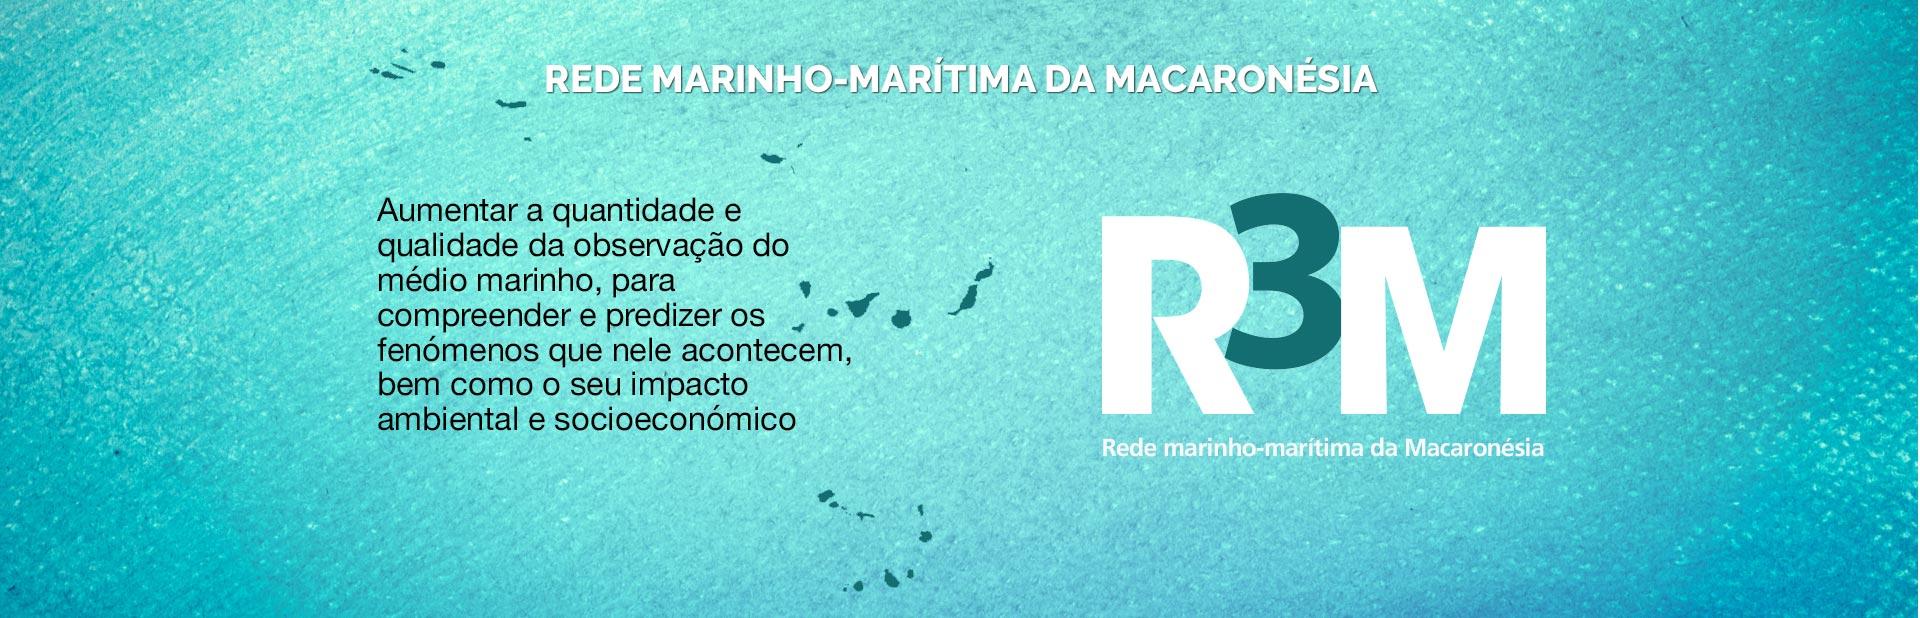 R3M_port